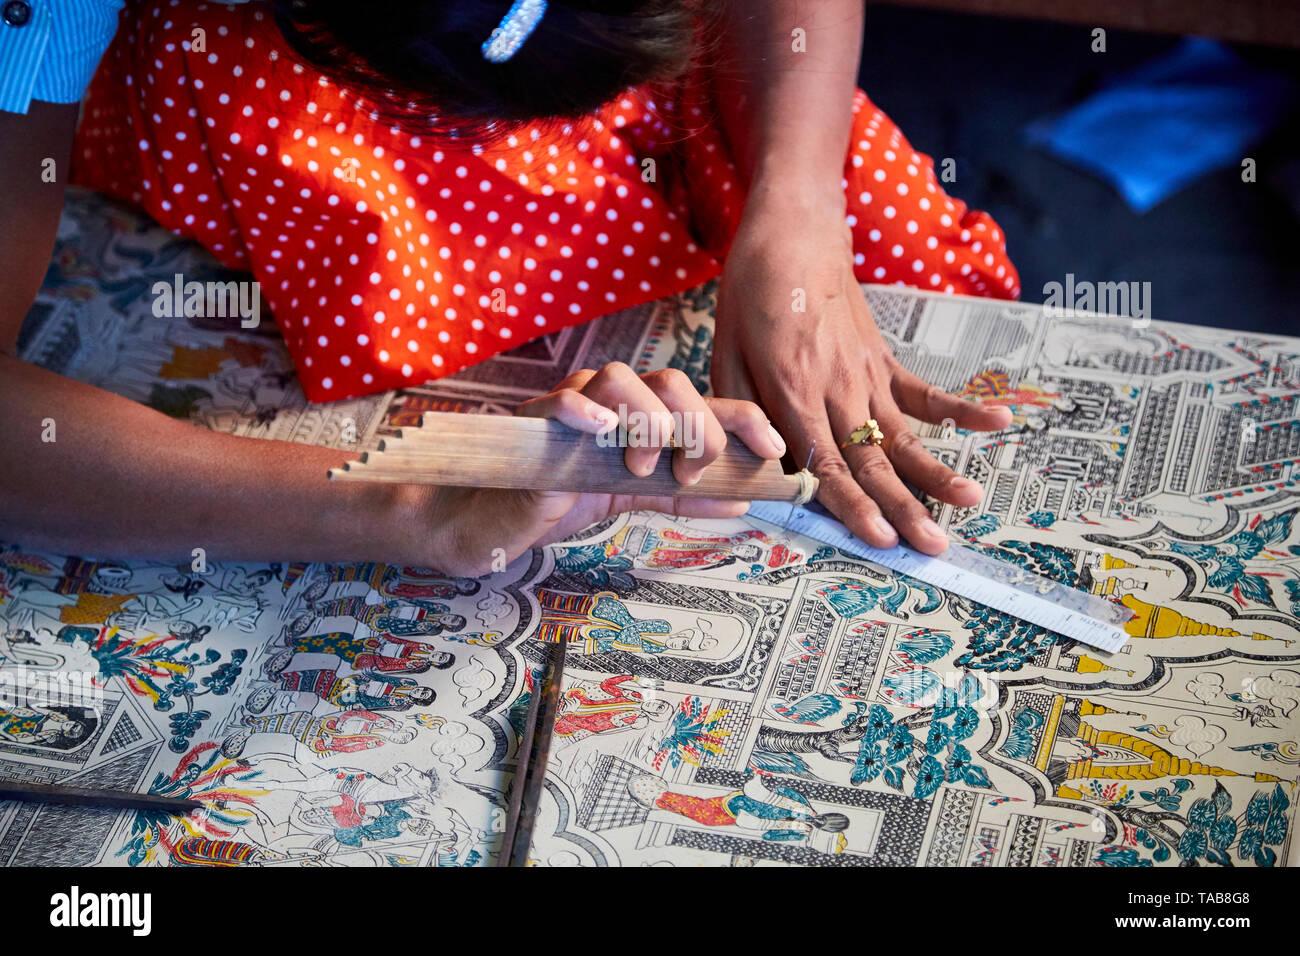 Woman working etching designs into enamelware in marketplace in Bagan, Myanmar. - Stock Image